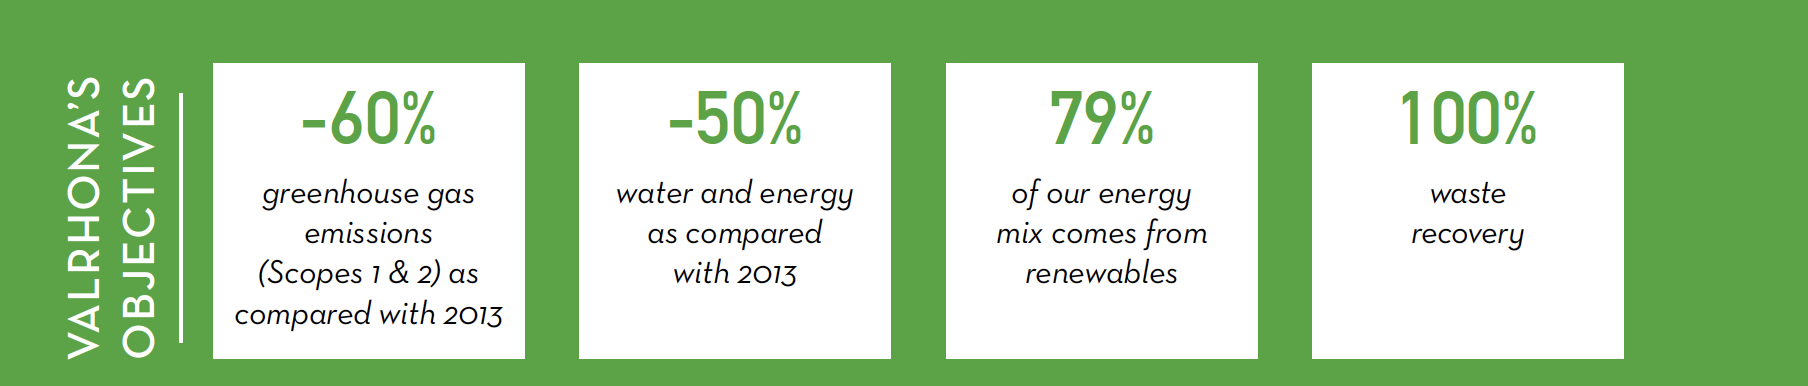 Valrhona CSR Report Carbon Footprint